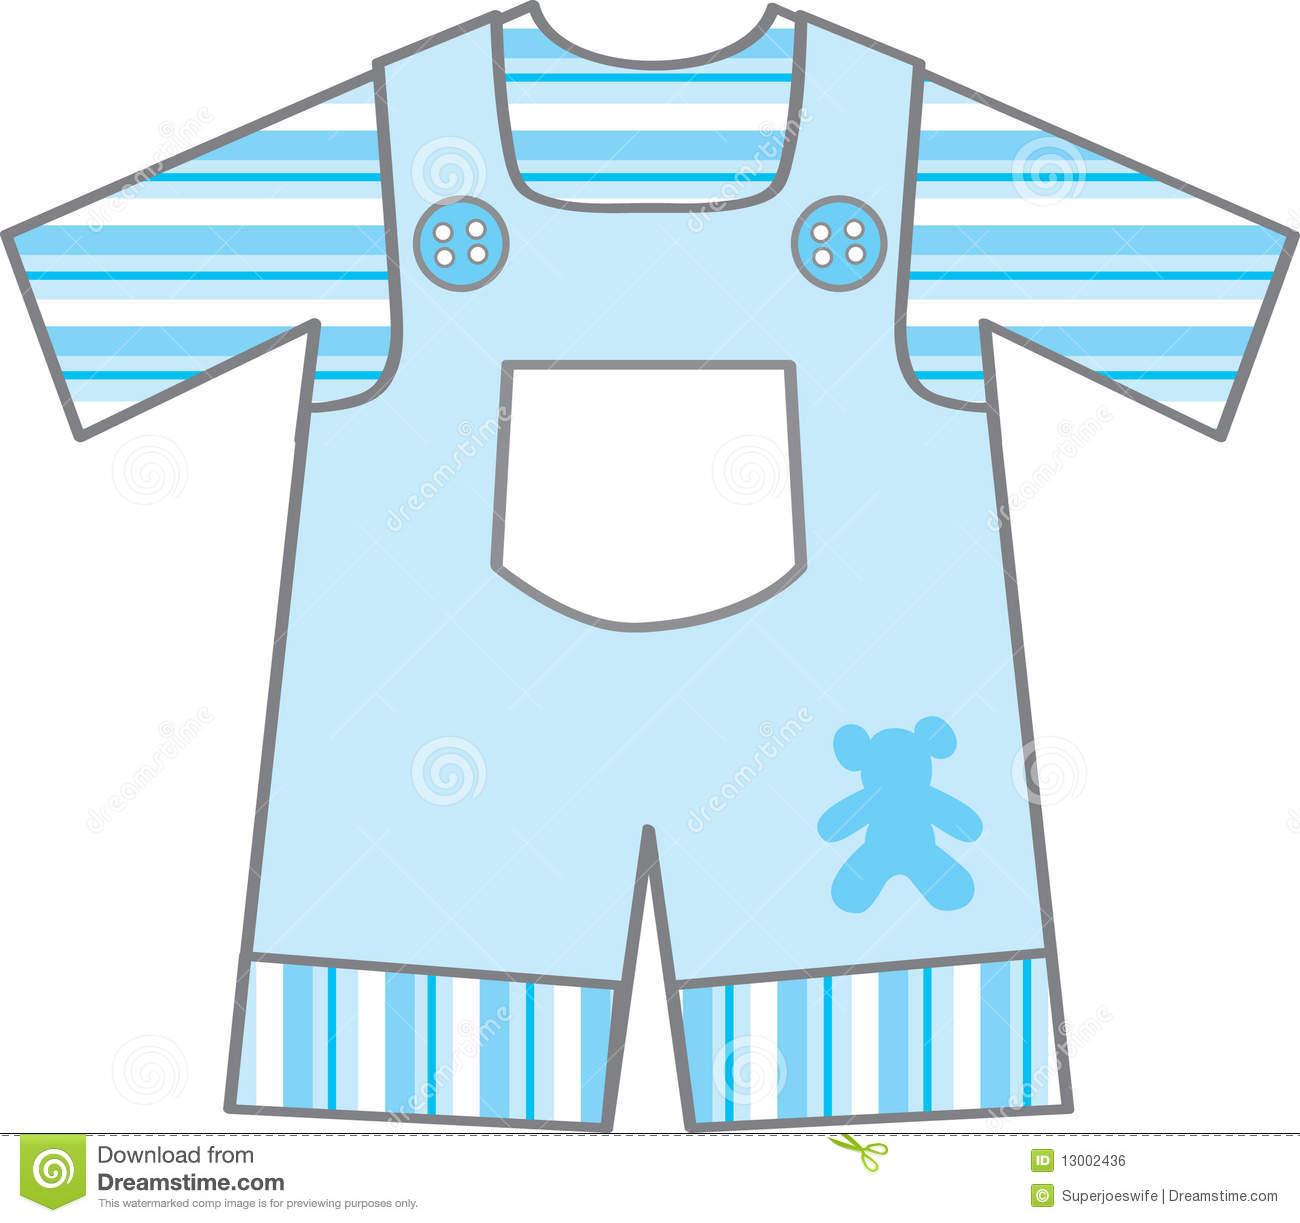 Boys' Clothes Clipart - Clipart Kid